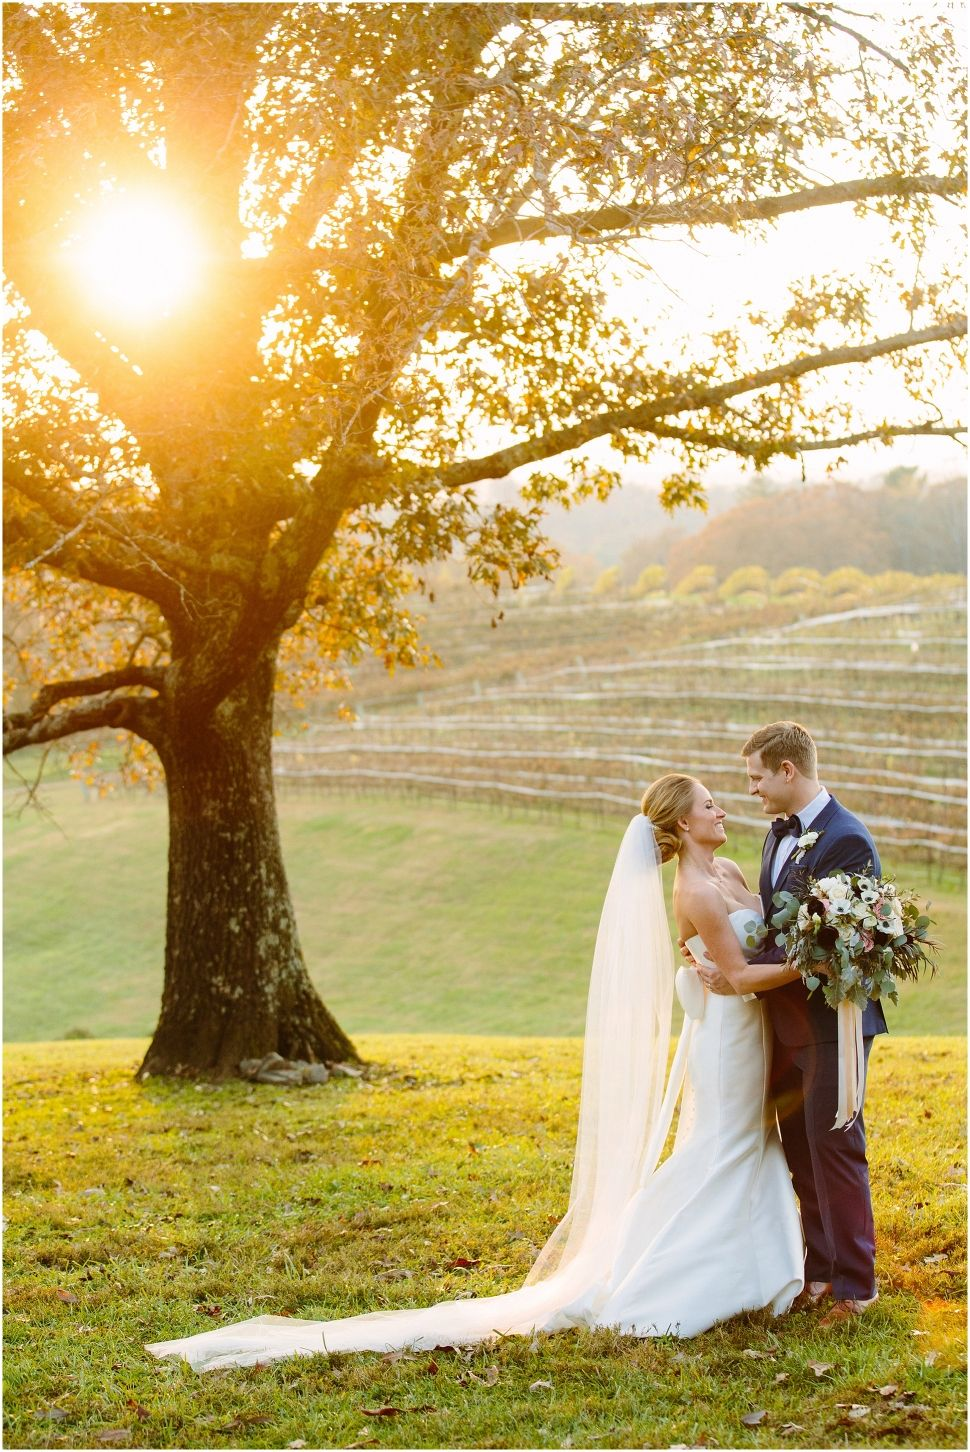 A Romantic Fall Winery Wedding At Monteluce Winery And Vineyards Monteluce Winery Dahlonega Winery Wedding Photos Outdoor Wedding Backdrops Winery Weddings